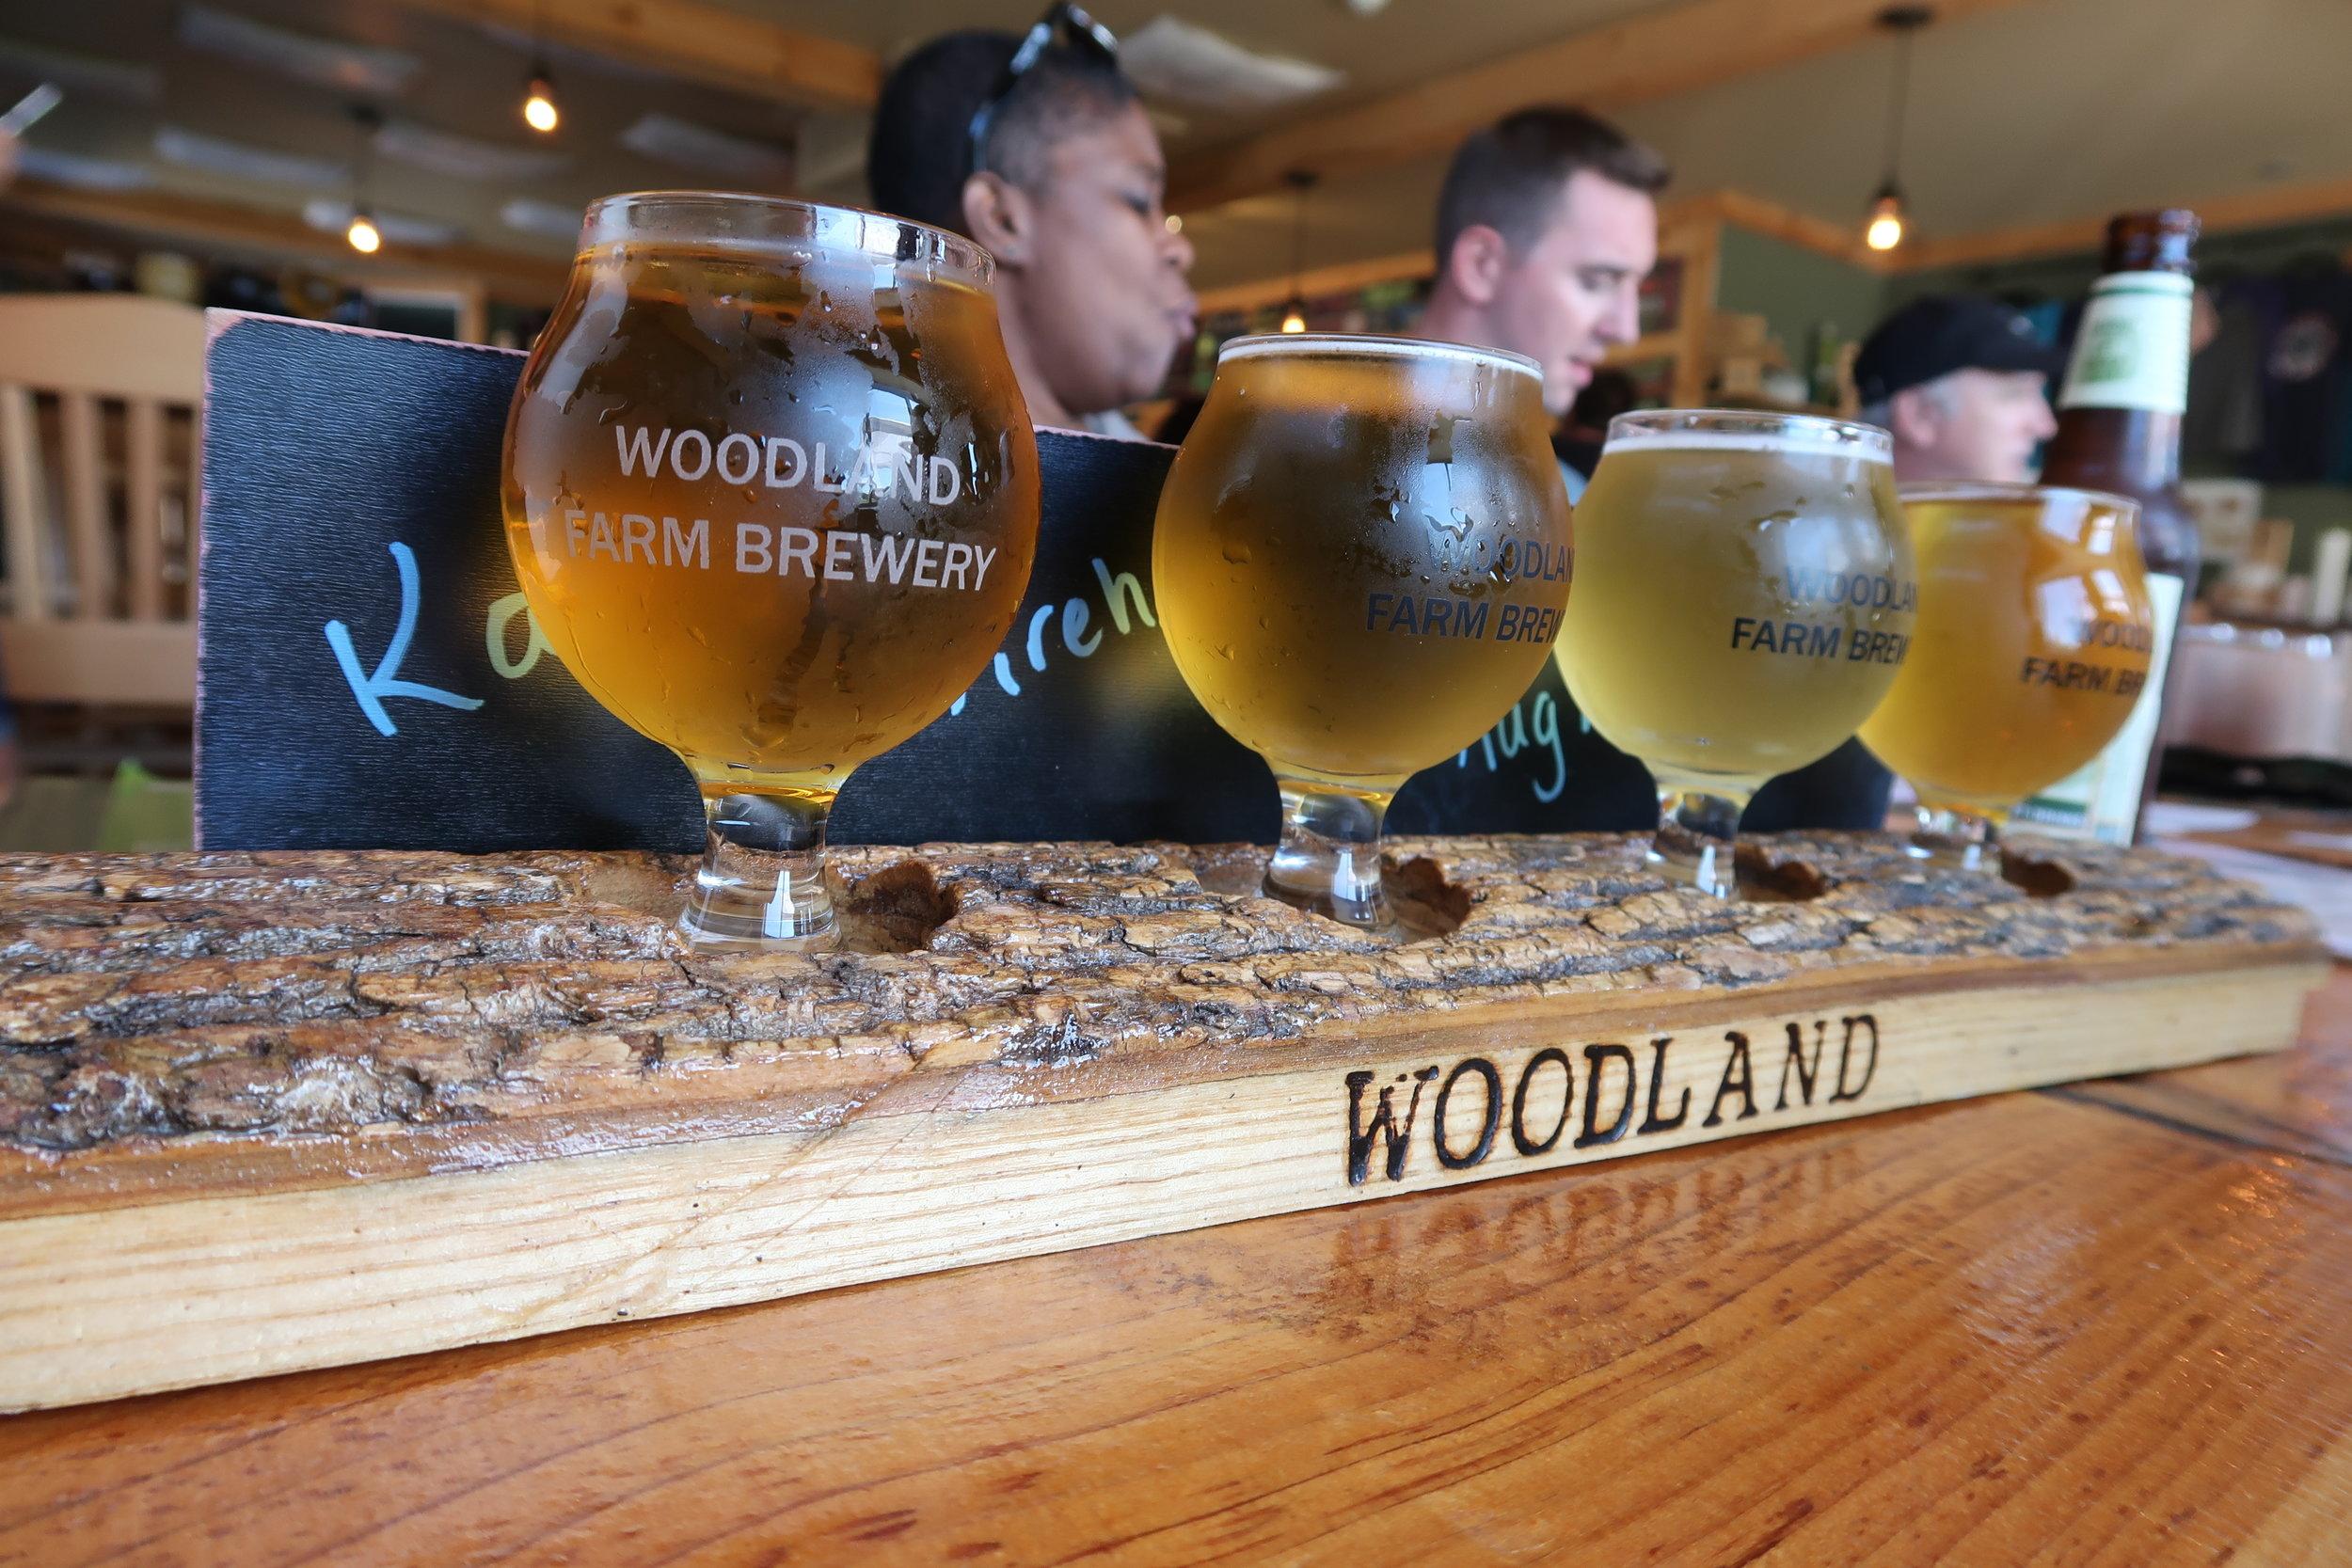 Woodland Brewery